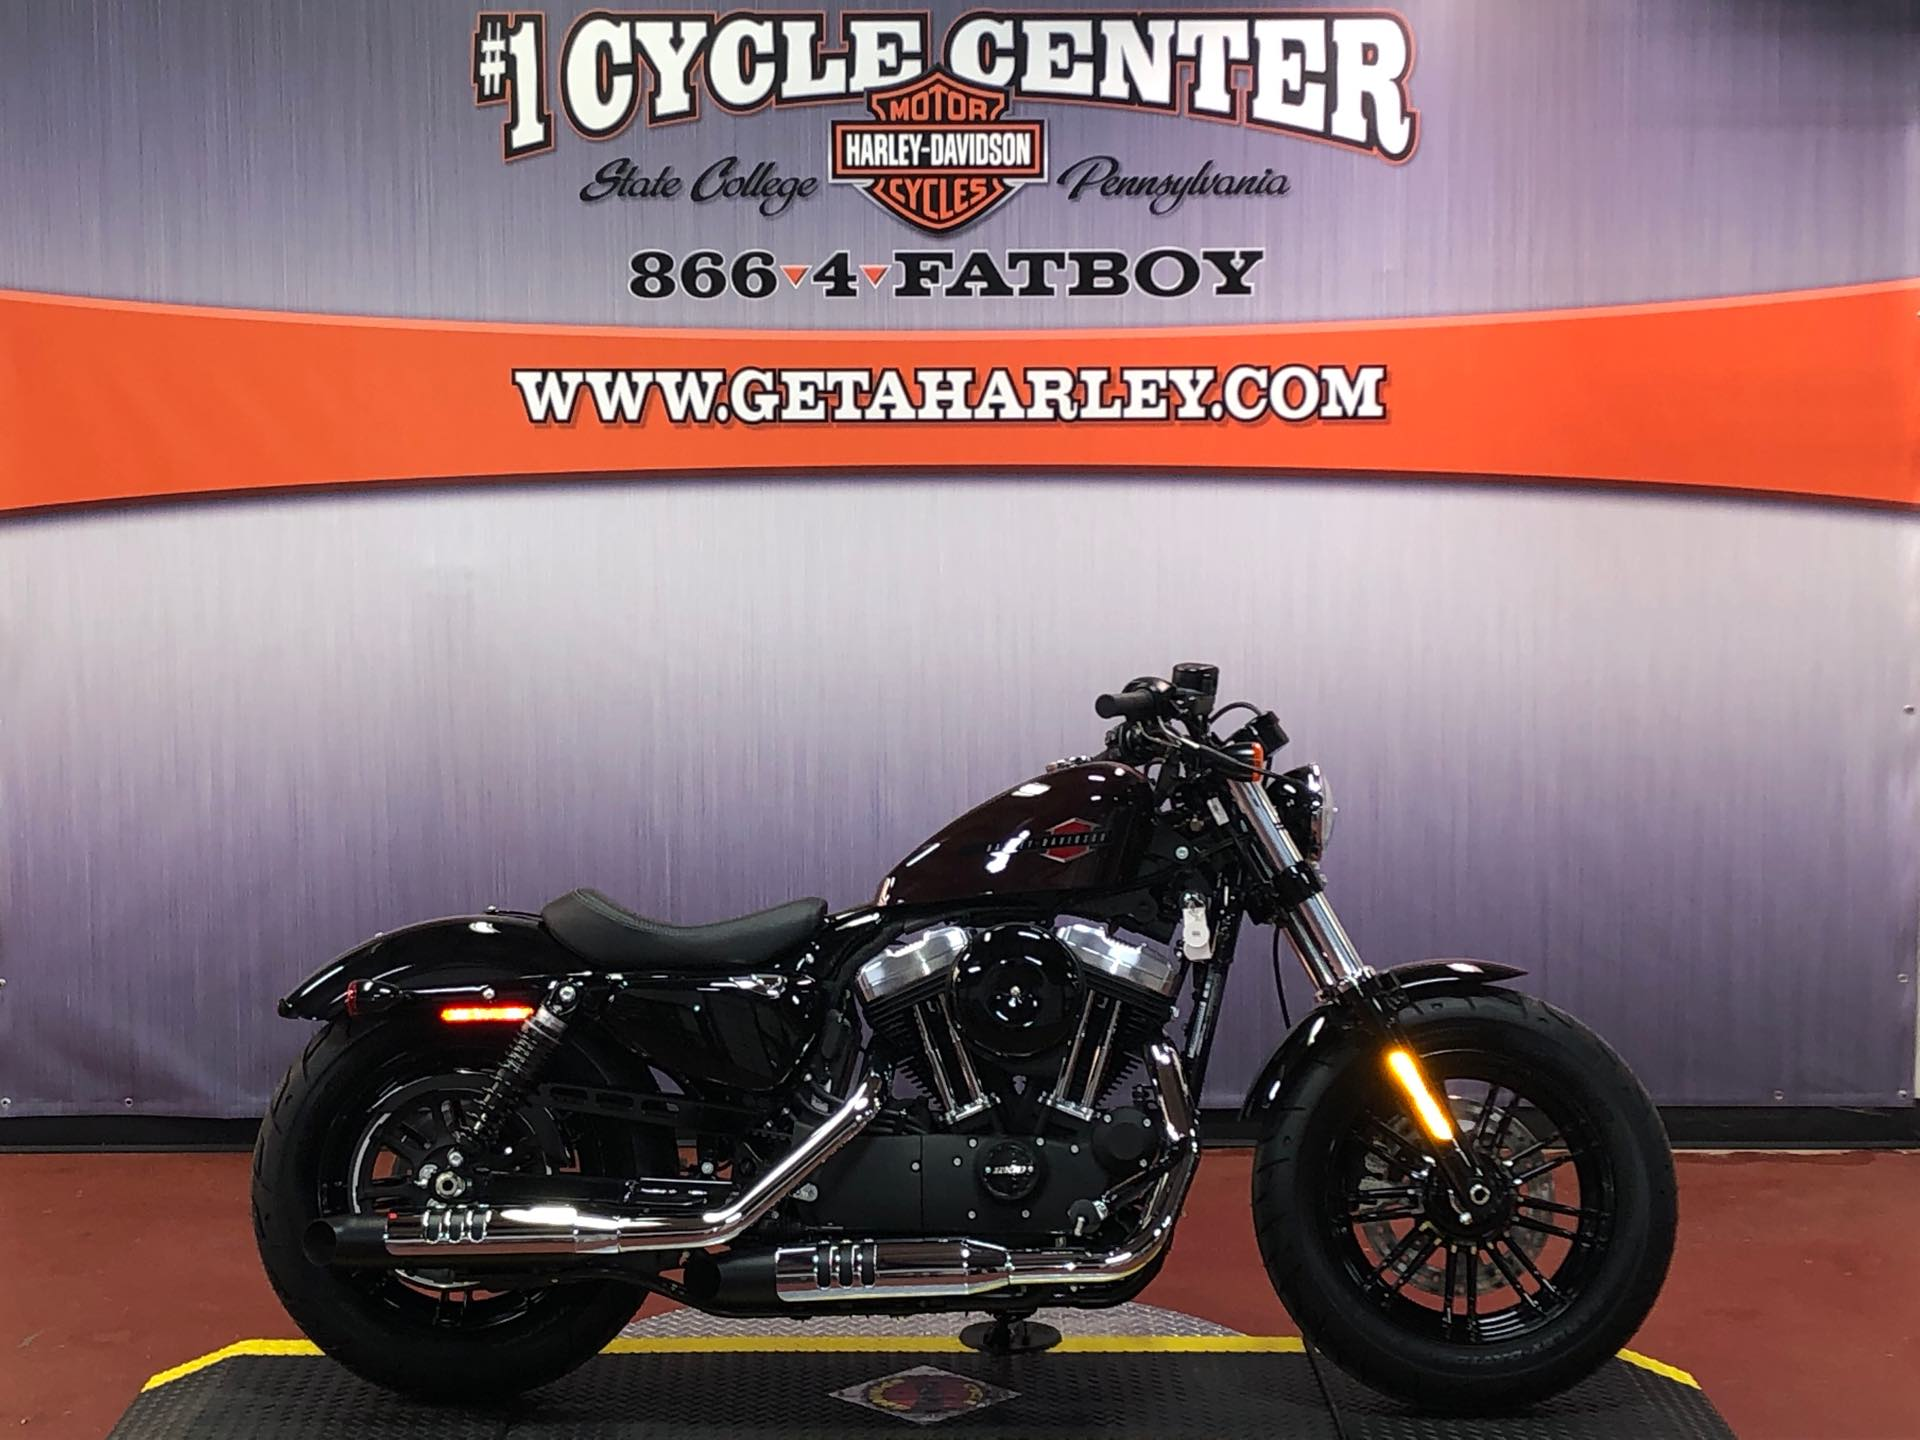 2021 Harley-Davidson XL1200X at #1 Cycle Center Harley-Davidson